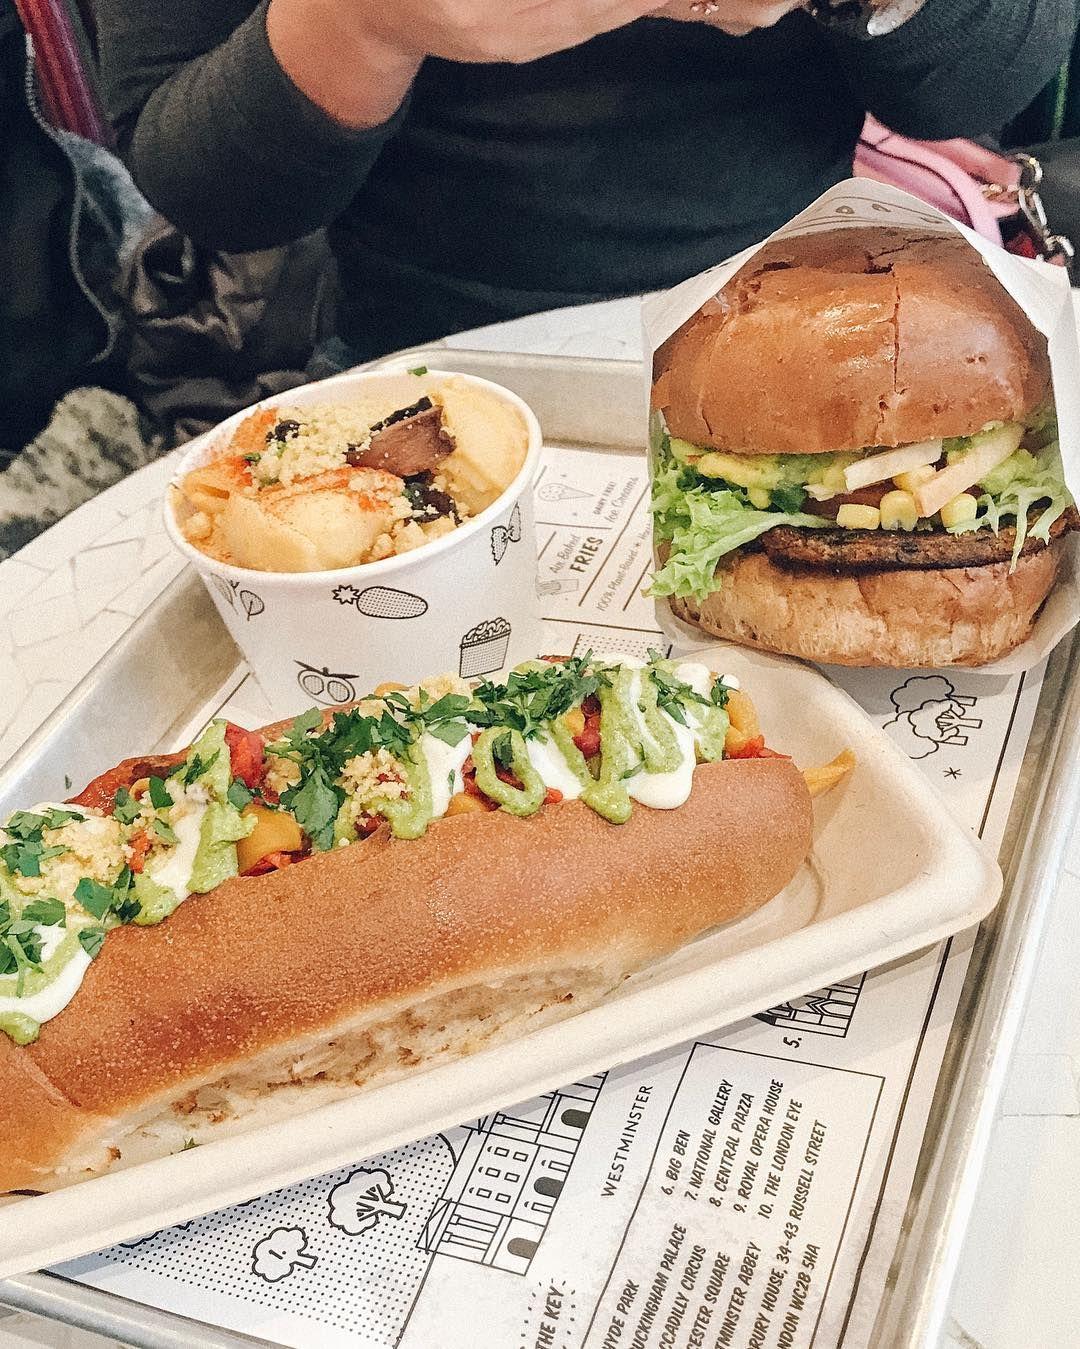 By Chloe Is A Vegan Fast Food Heaven Eatbychloe Dinemillennial Vegan Fast Food Recipes From Heaven Food